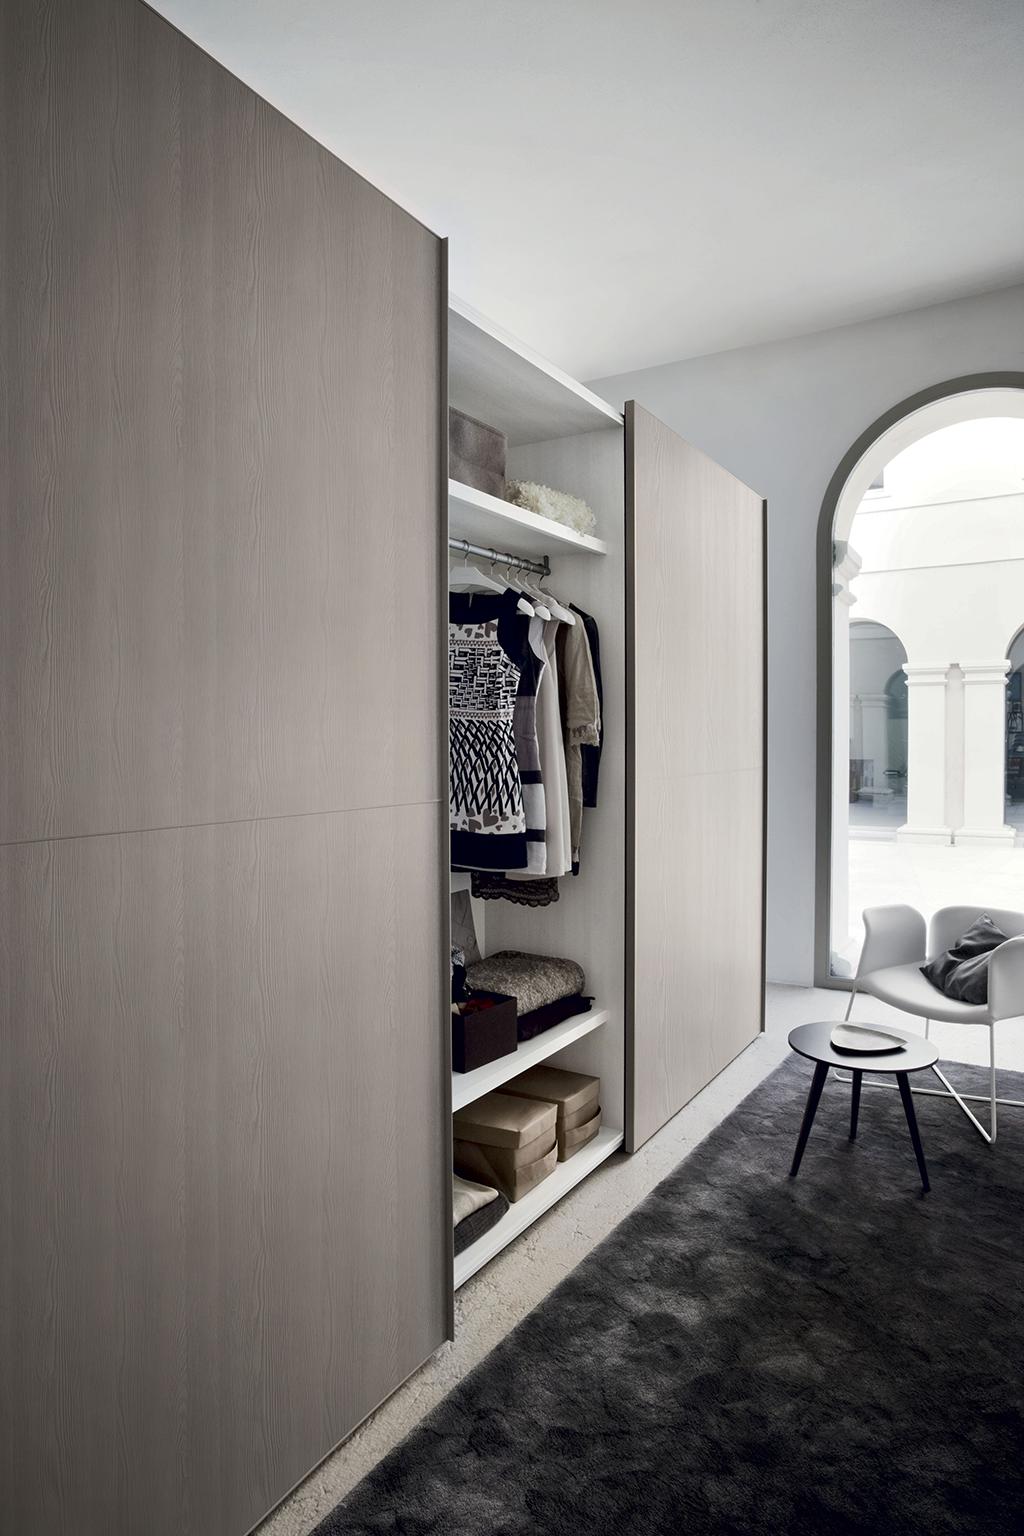 amore 015 fitted bedroom furniture wardrobes uk lawrence walsh furniture. Black Bedroom Furniture Sets. Home Design Ideas